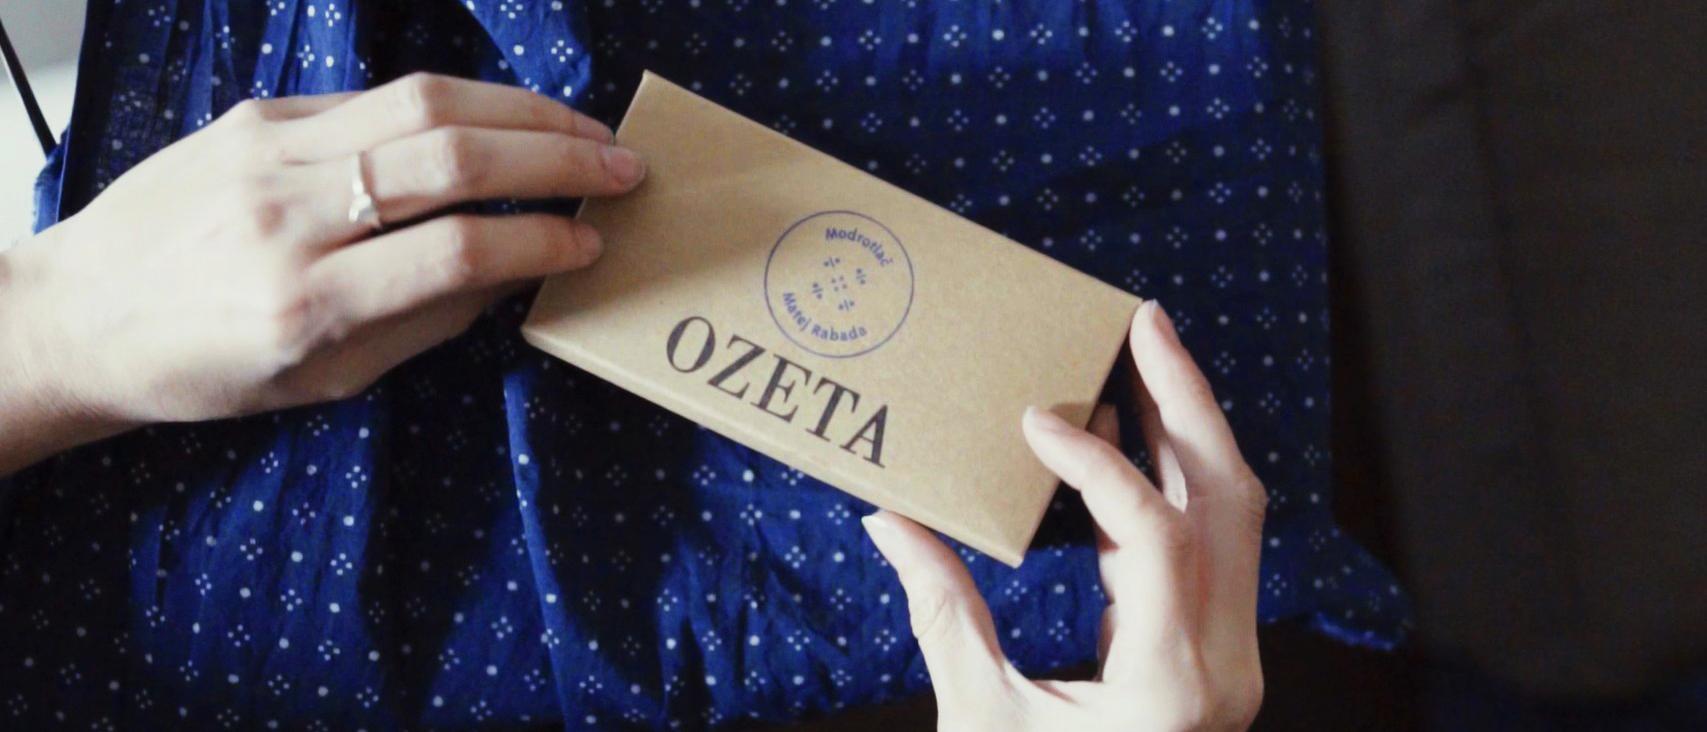 OZETA - Blueprinting